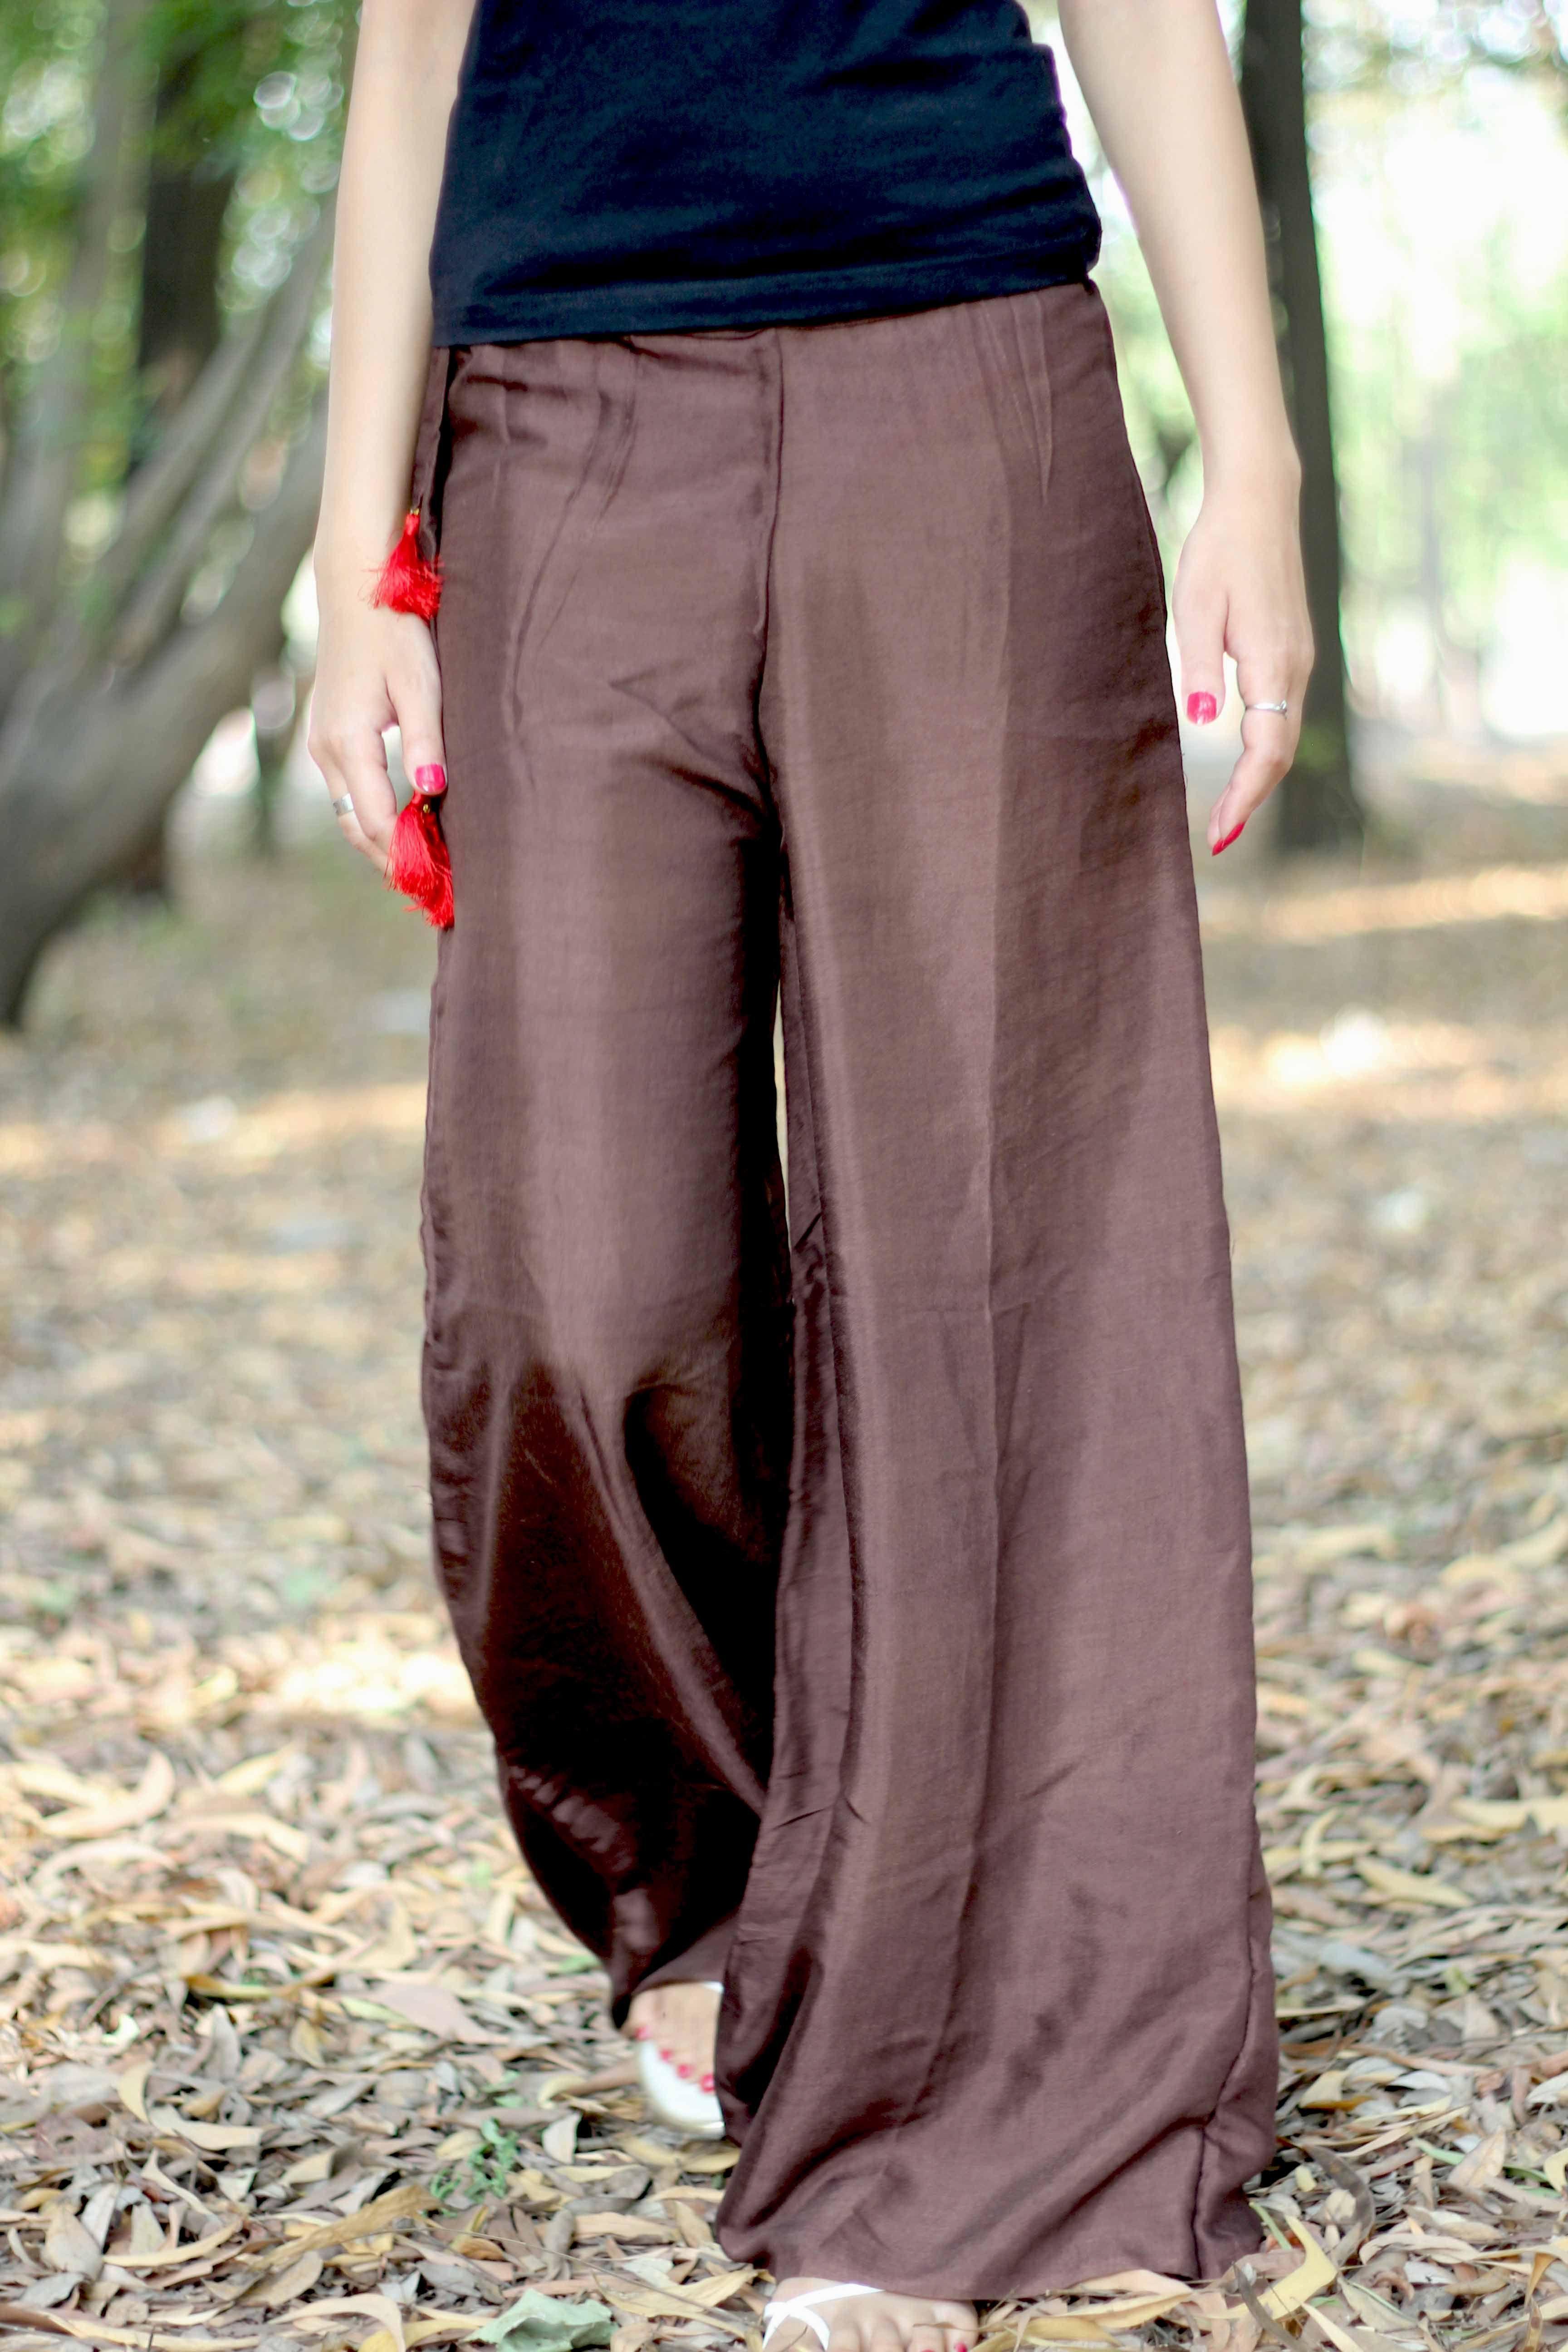 58473582b0 Brown SILK Pants Wide Leg Trousers Women Harem Pants by aaberi, $27.00